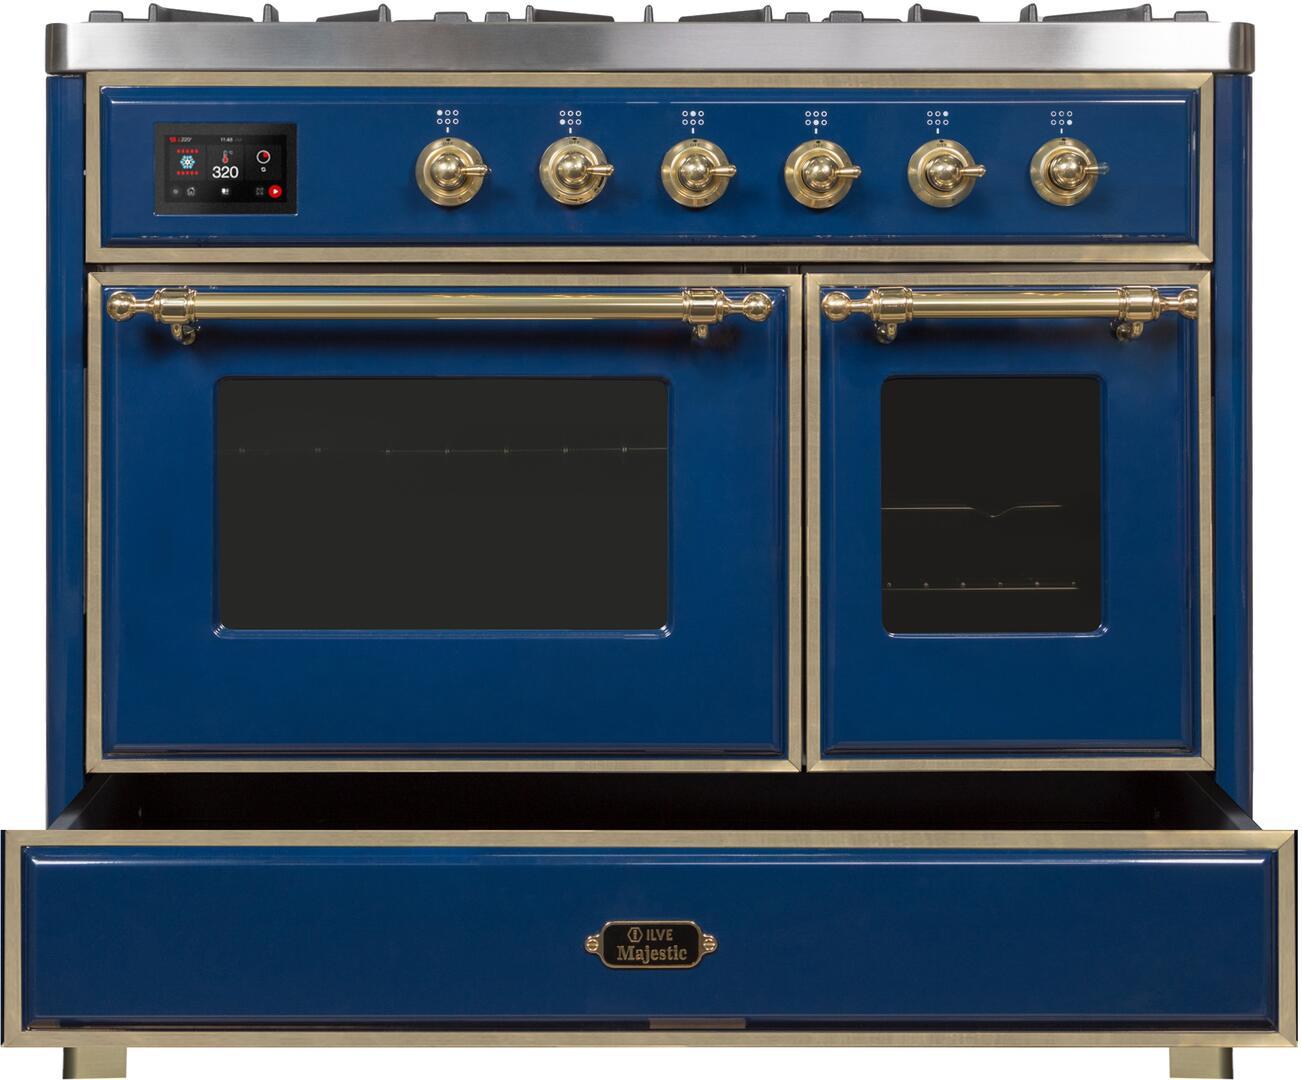 Ilve Majestic II UMD10FDNS3MBG Freestanding Dual Fuel Range Blue, UMD10FDNS3MBG Dishwarming Drawer